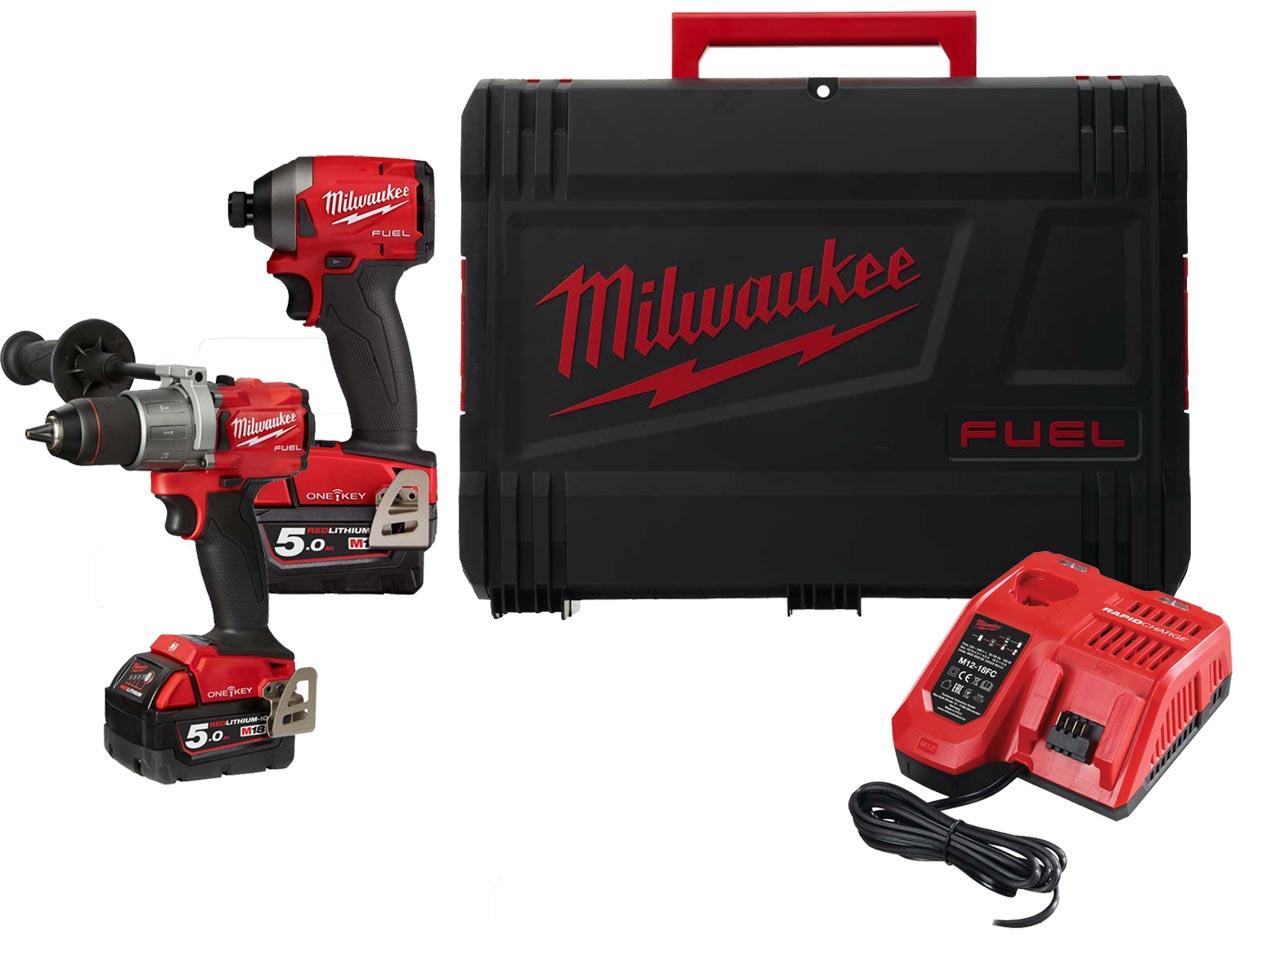 Milwaukee 18V Combi & Impact M18ONEPP2A2-502X 2x5.0Ah Li-ion FUEL ONE-KEY Twin Pack £389 at FFX